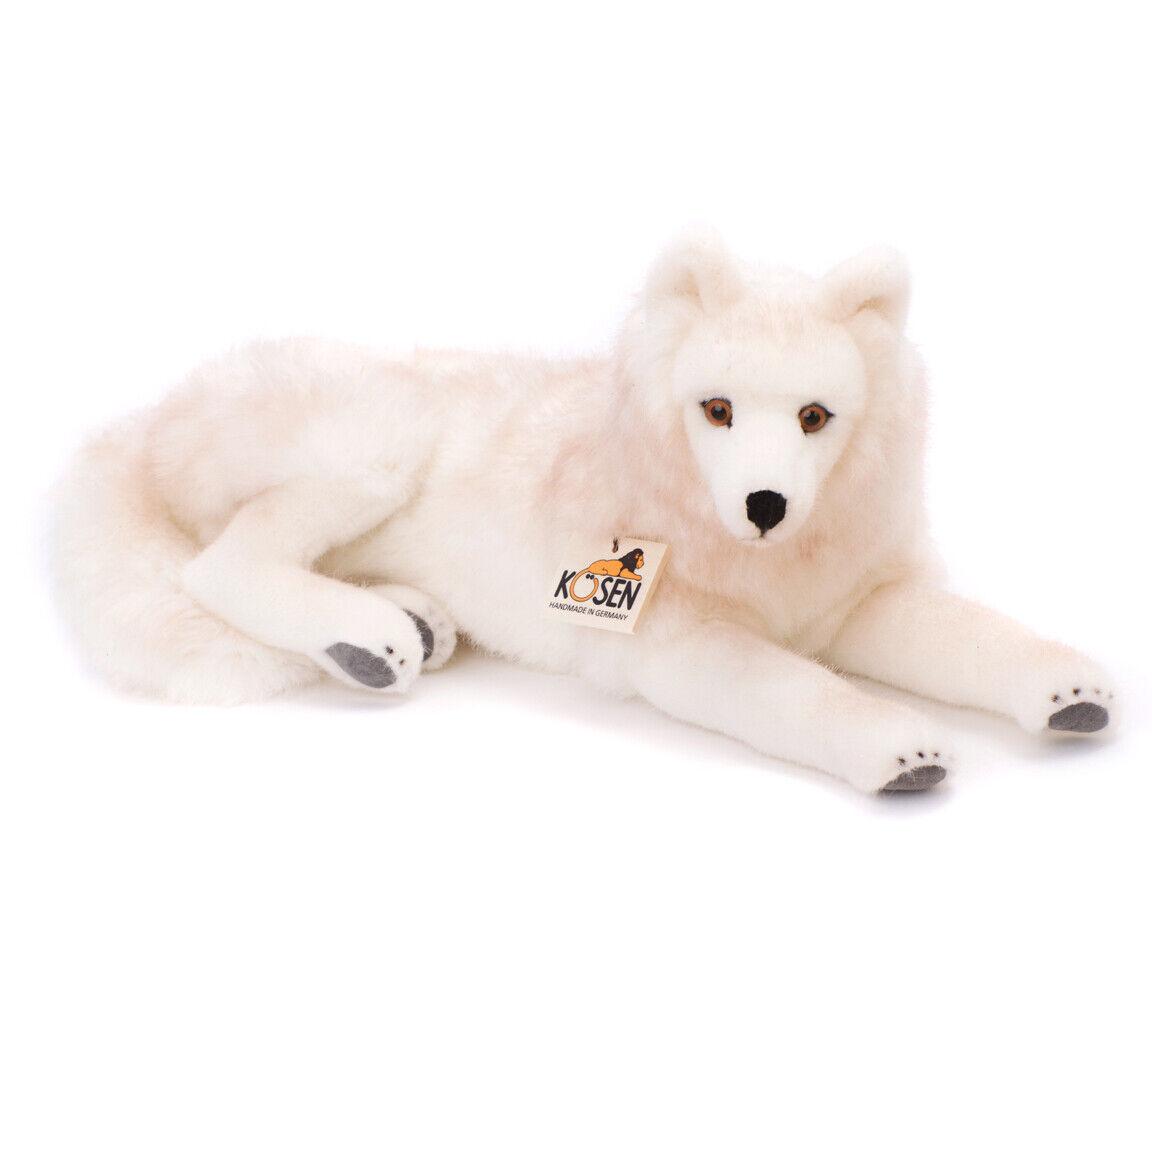 Arctic Polar Wolf collectable plush soft toy - Kosen   Kösen - 6070 - 41cm